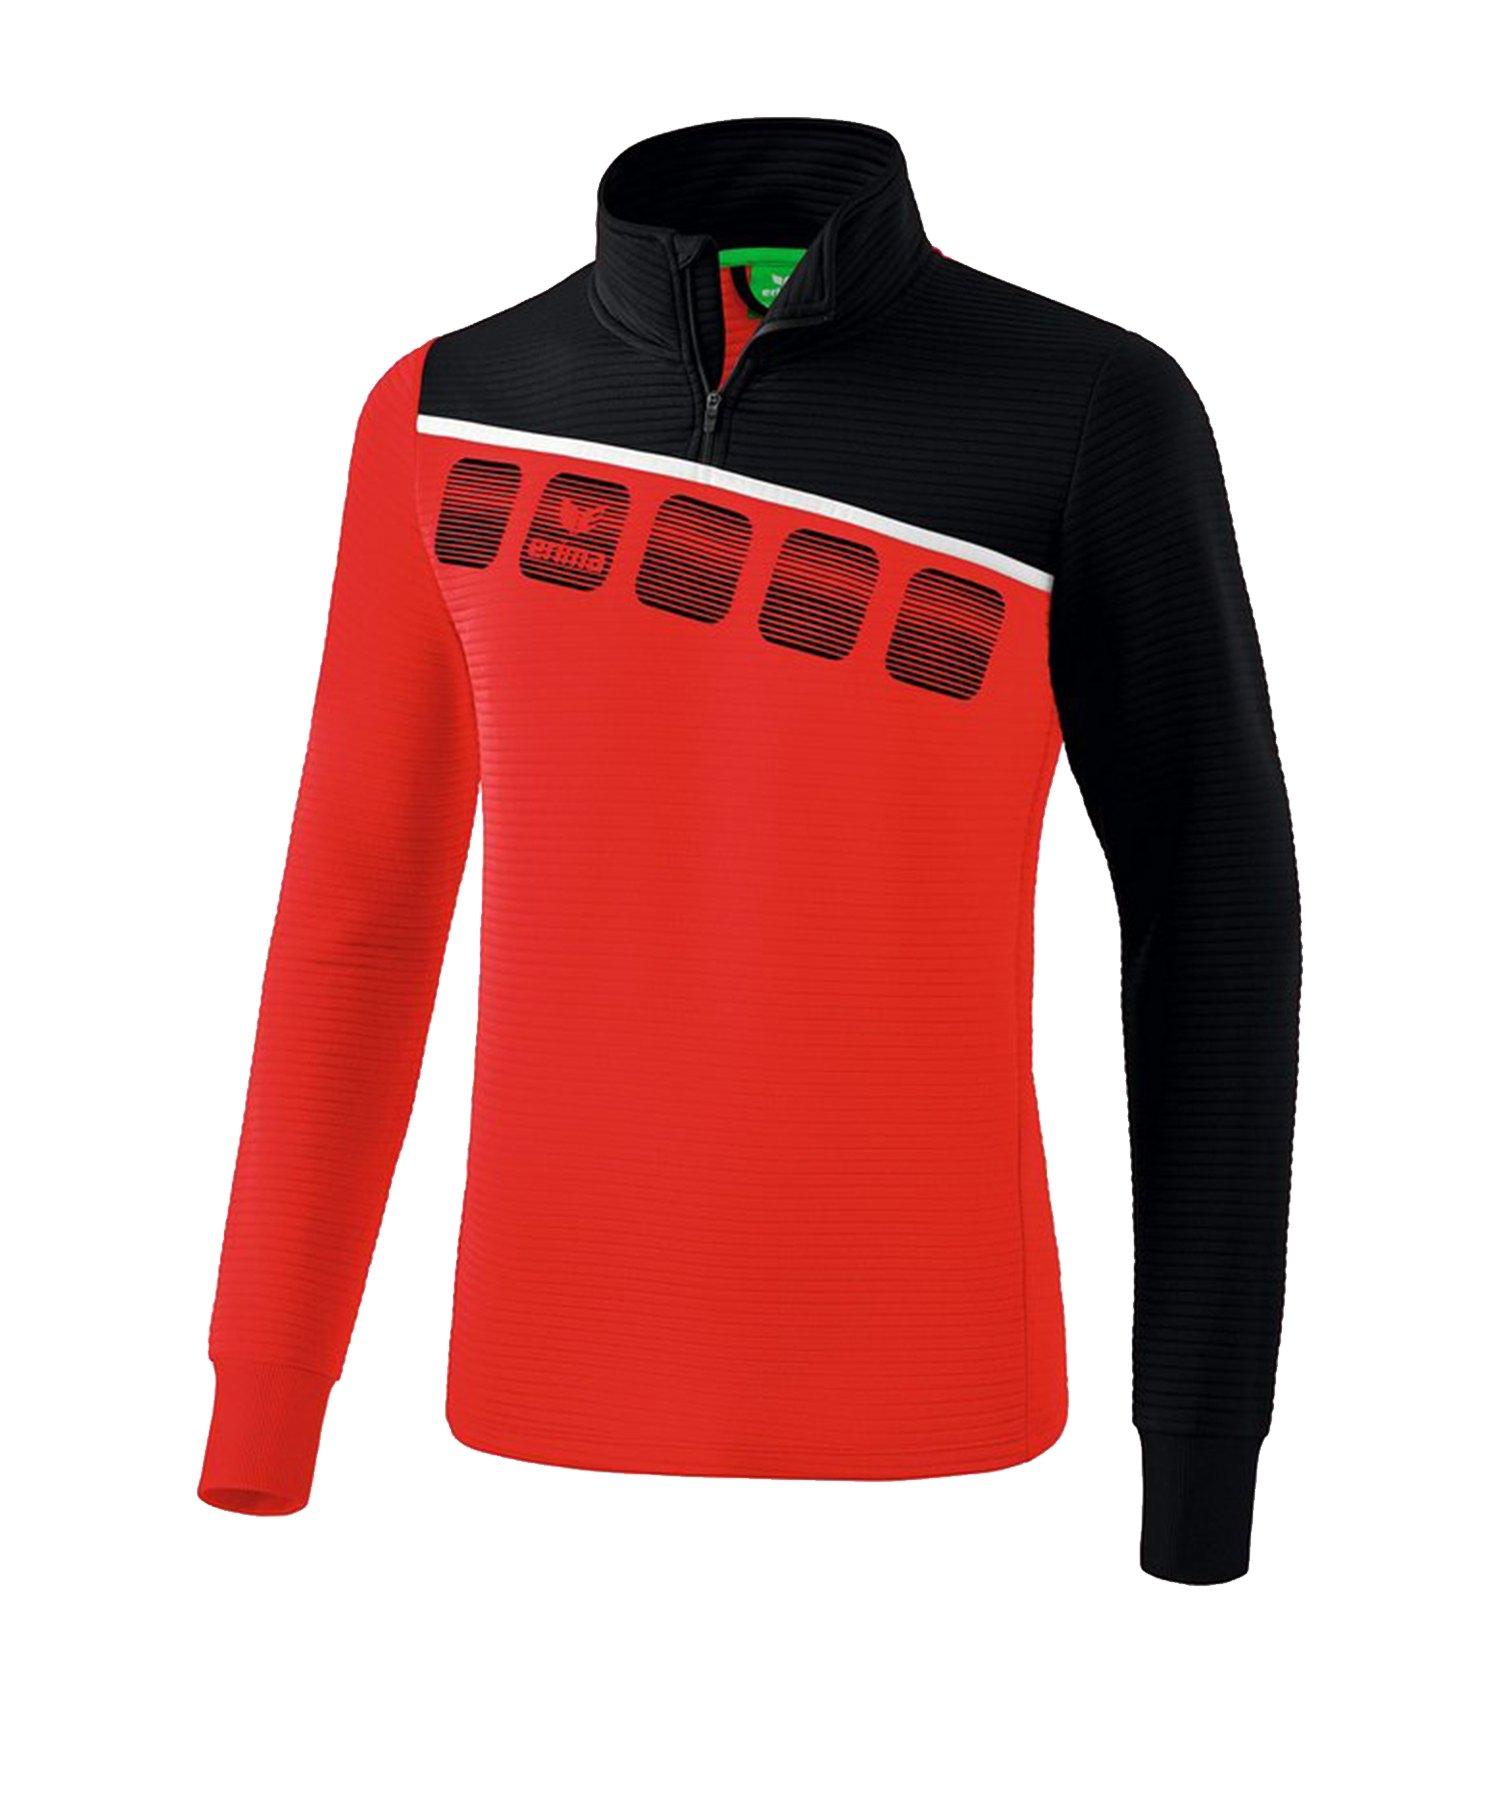 Erima 5-C Trainingstop Rot Schwarz - Rot